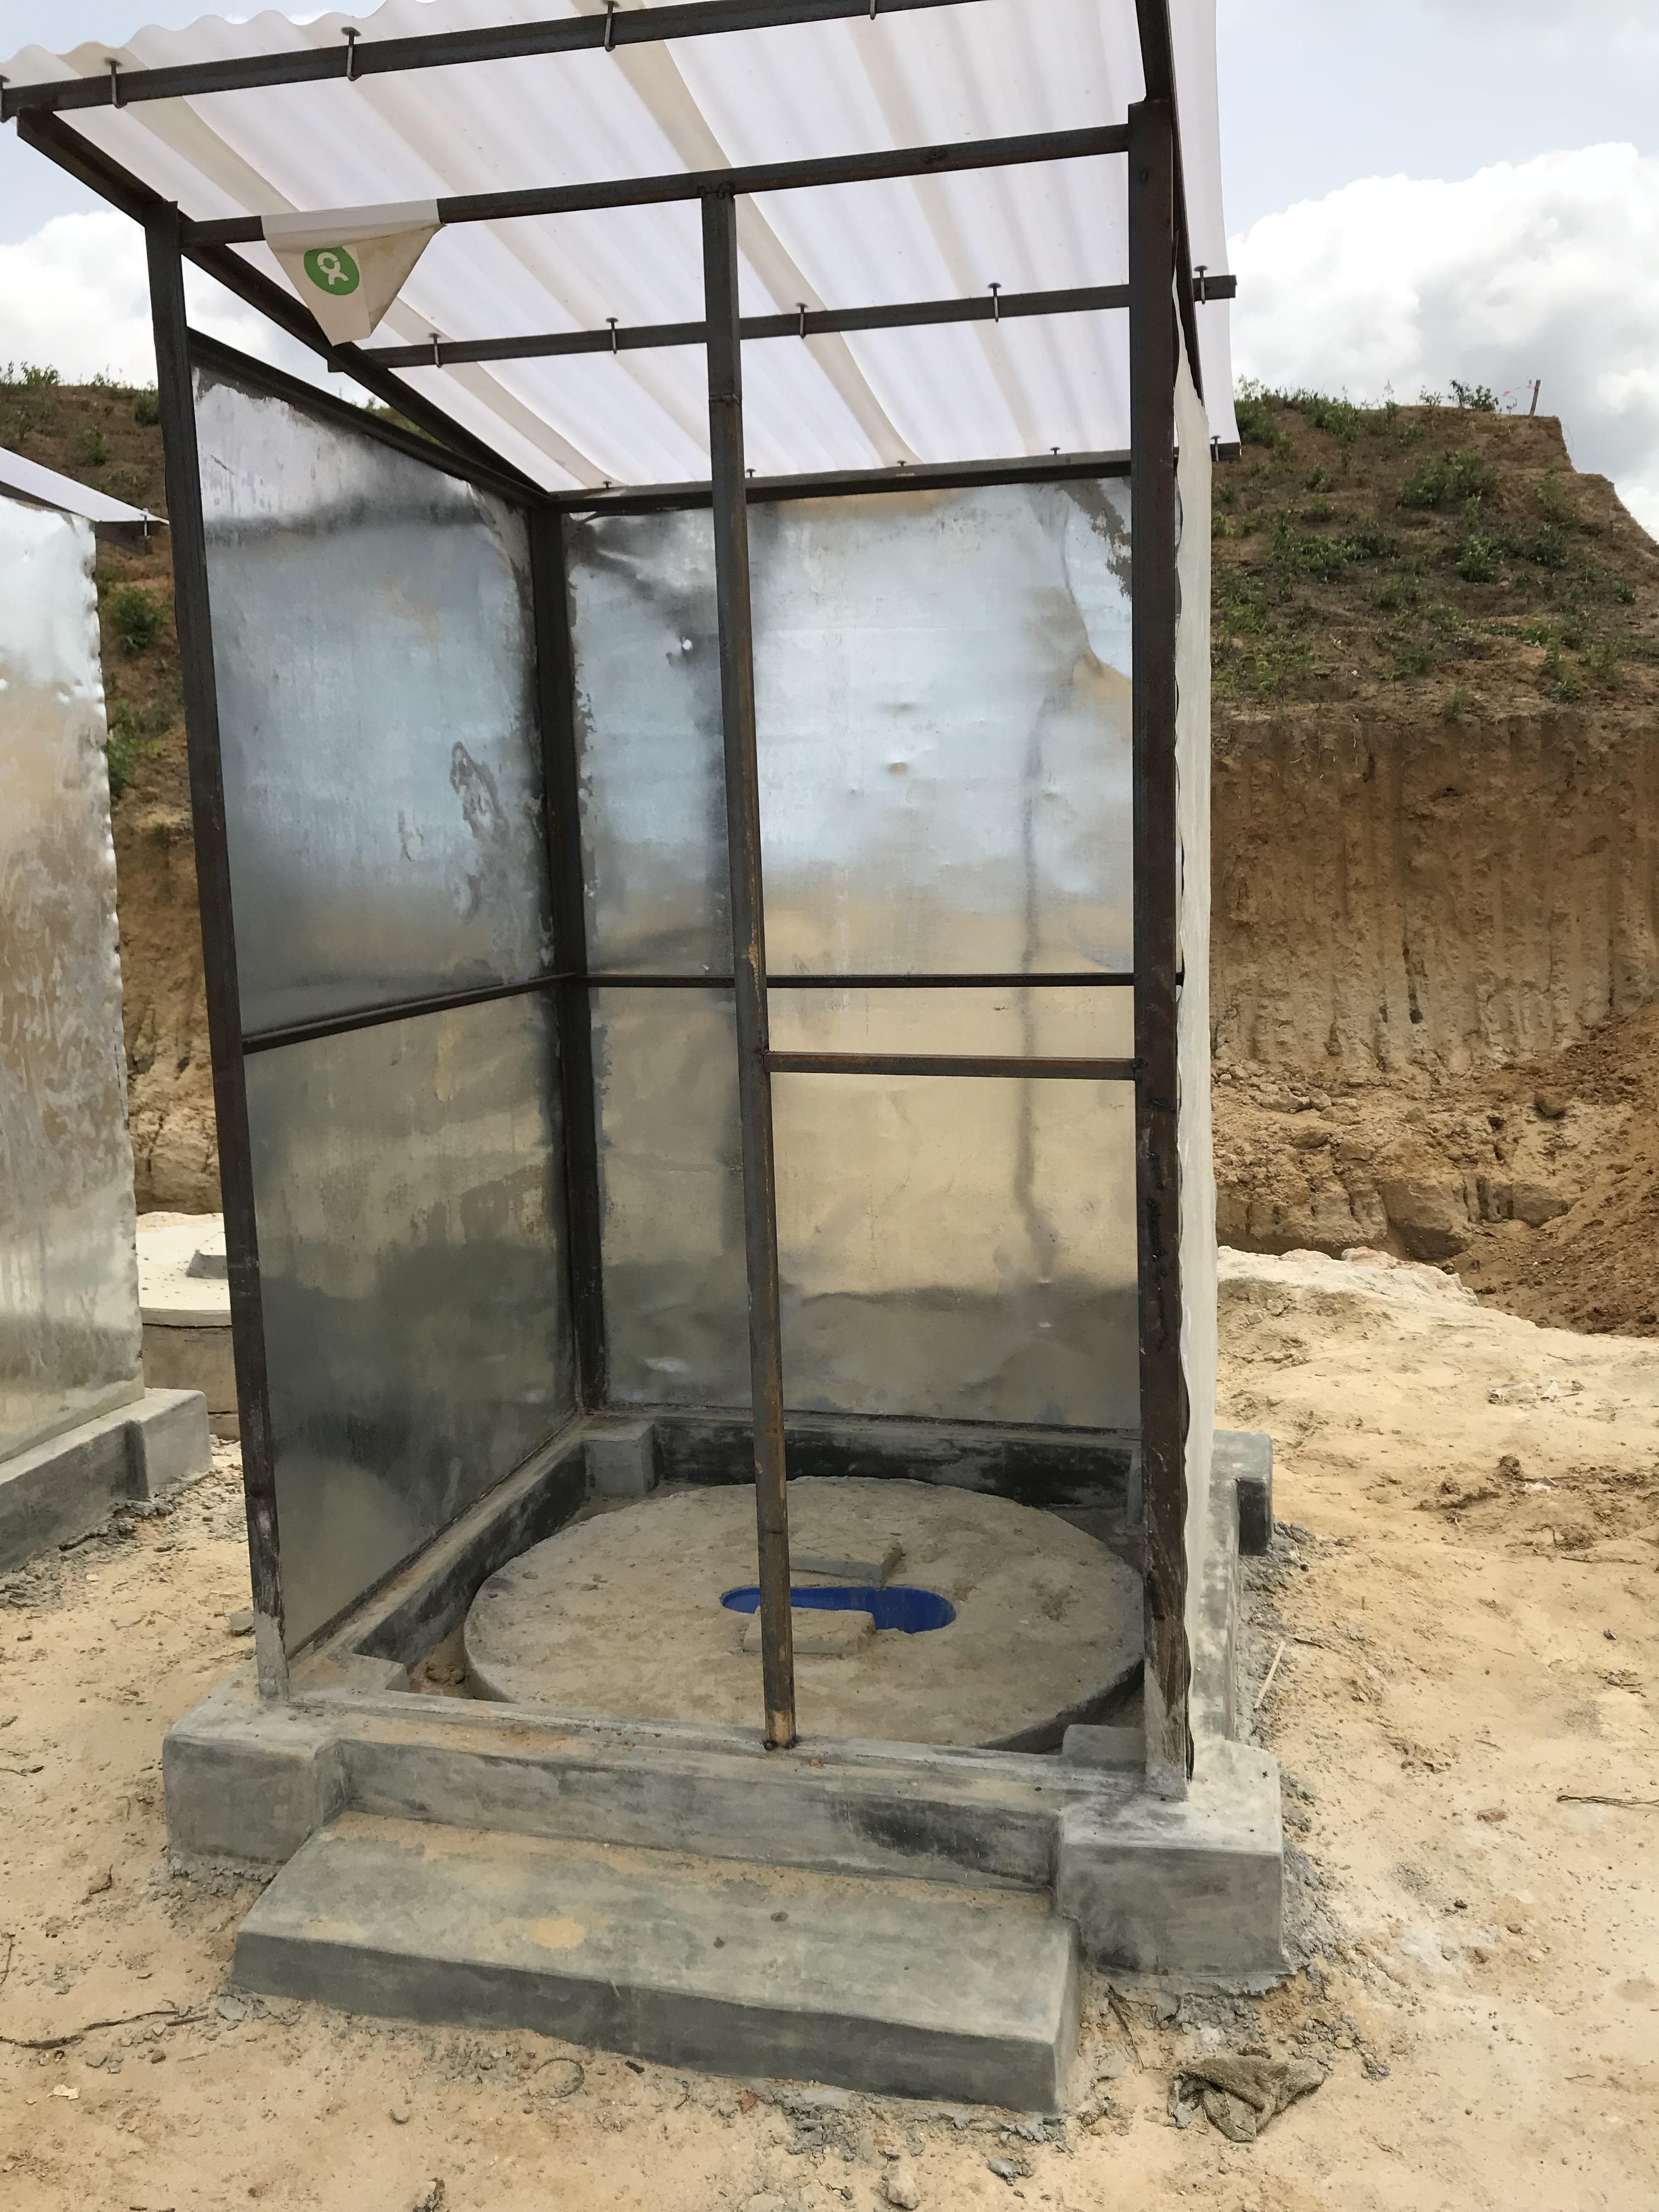 Sanitation facilities under construction.